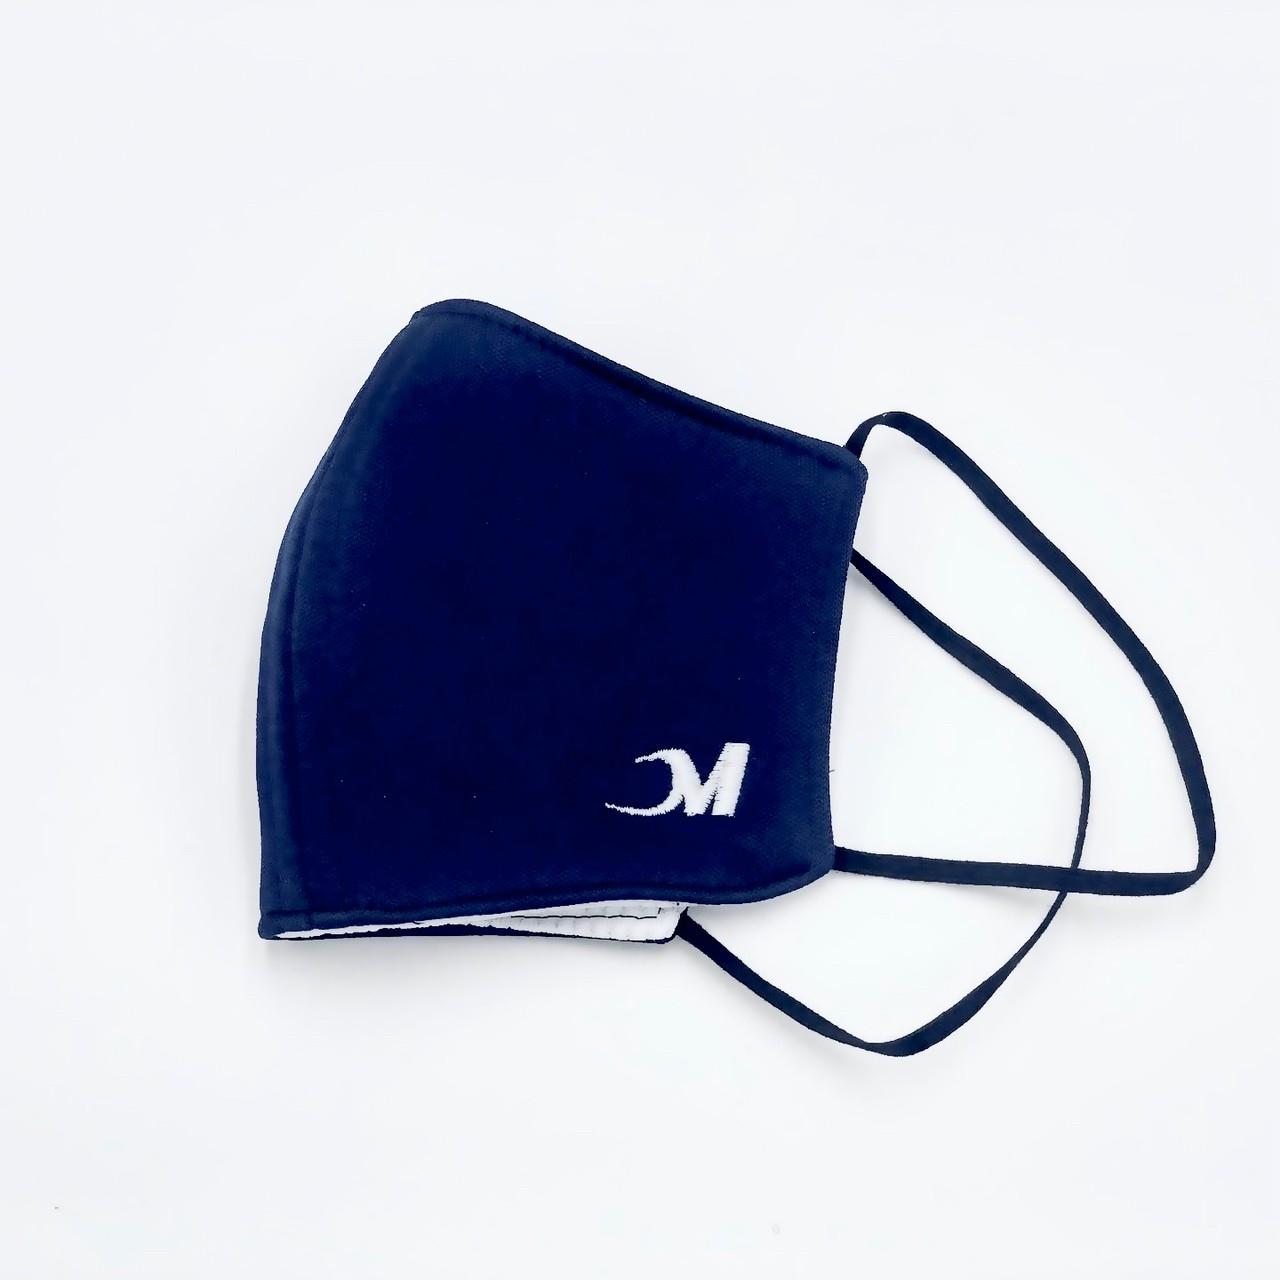 MAJOR STAGE ユニフォーム素材マスク 3 色セット MMK-2021